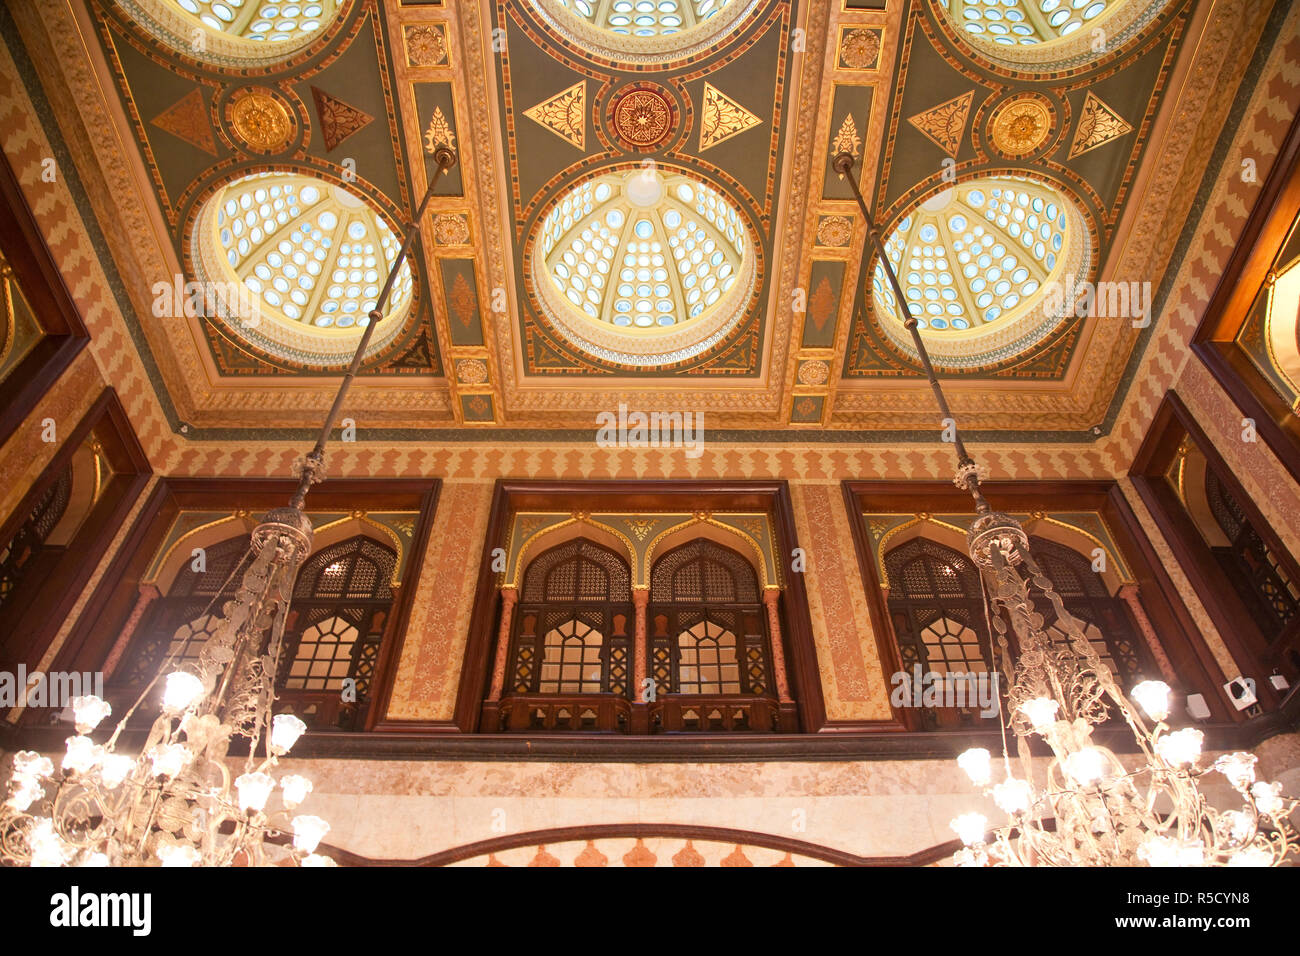 Kubbeli Saloon in the Pera Palace hotel, Beyoglu area, Istanbul, Turkey Stock Photo